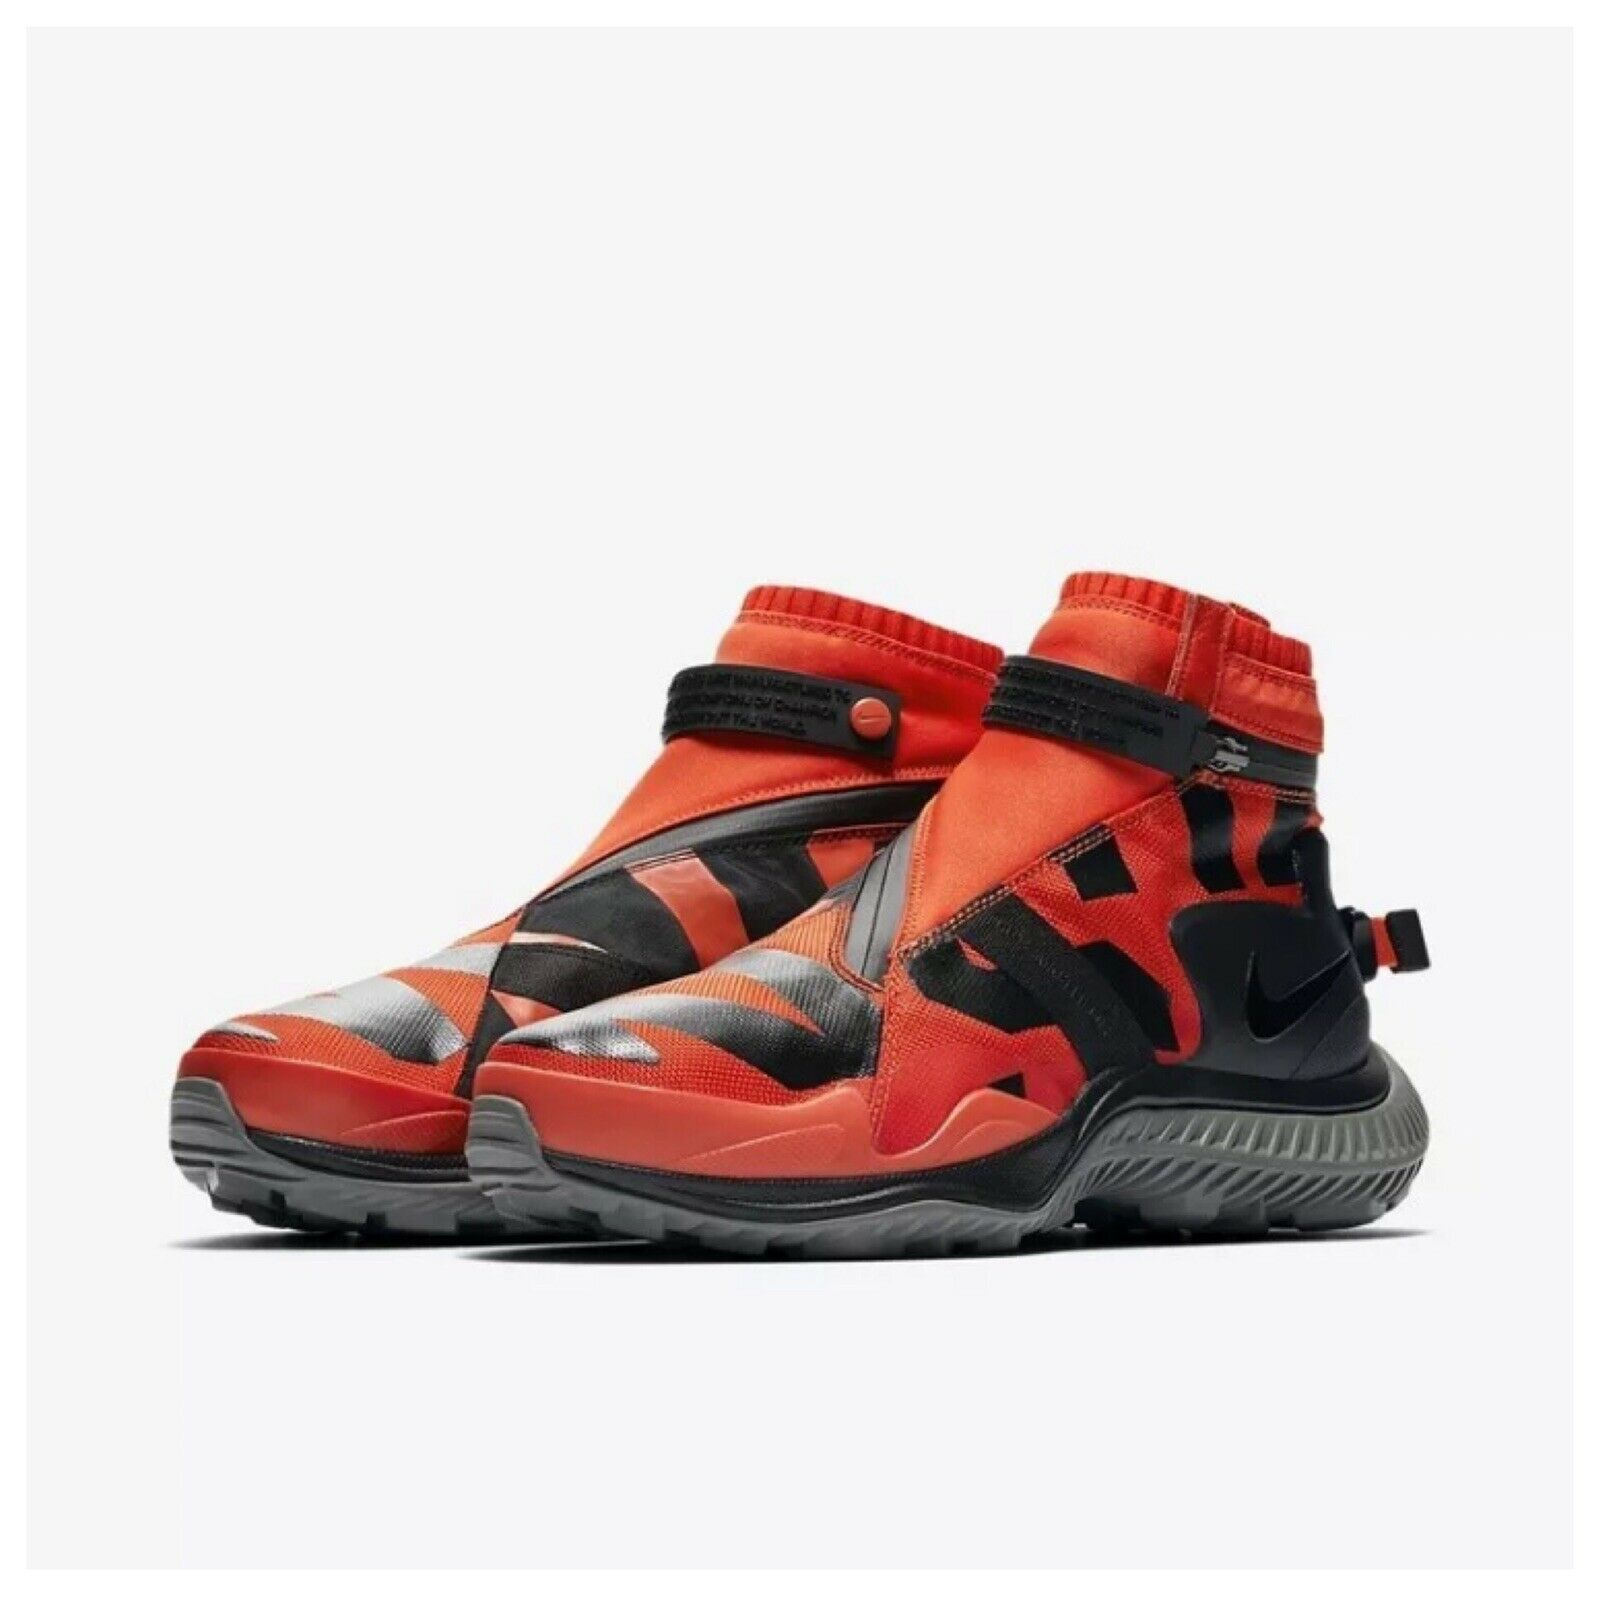 NEW Sz 10 Nike NSW NikeLab Sportswear Gaiter Boot orange Black AA0530-800  250